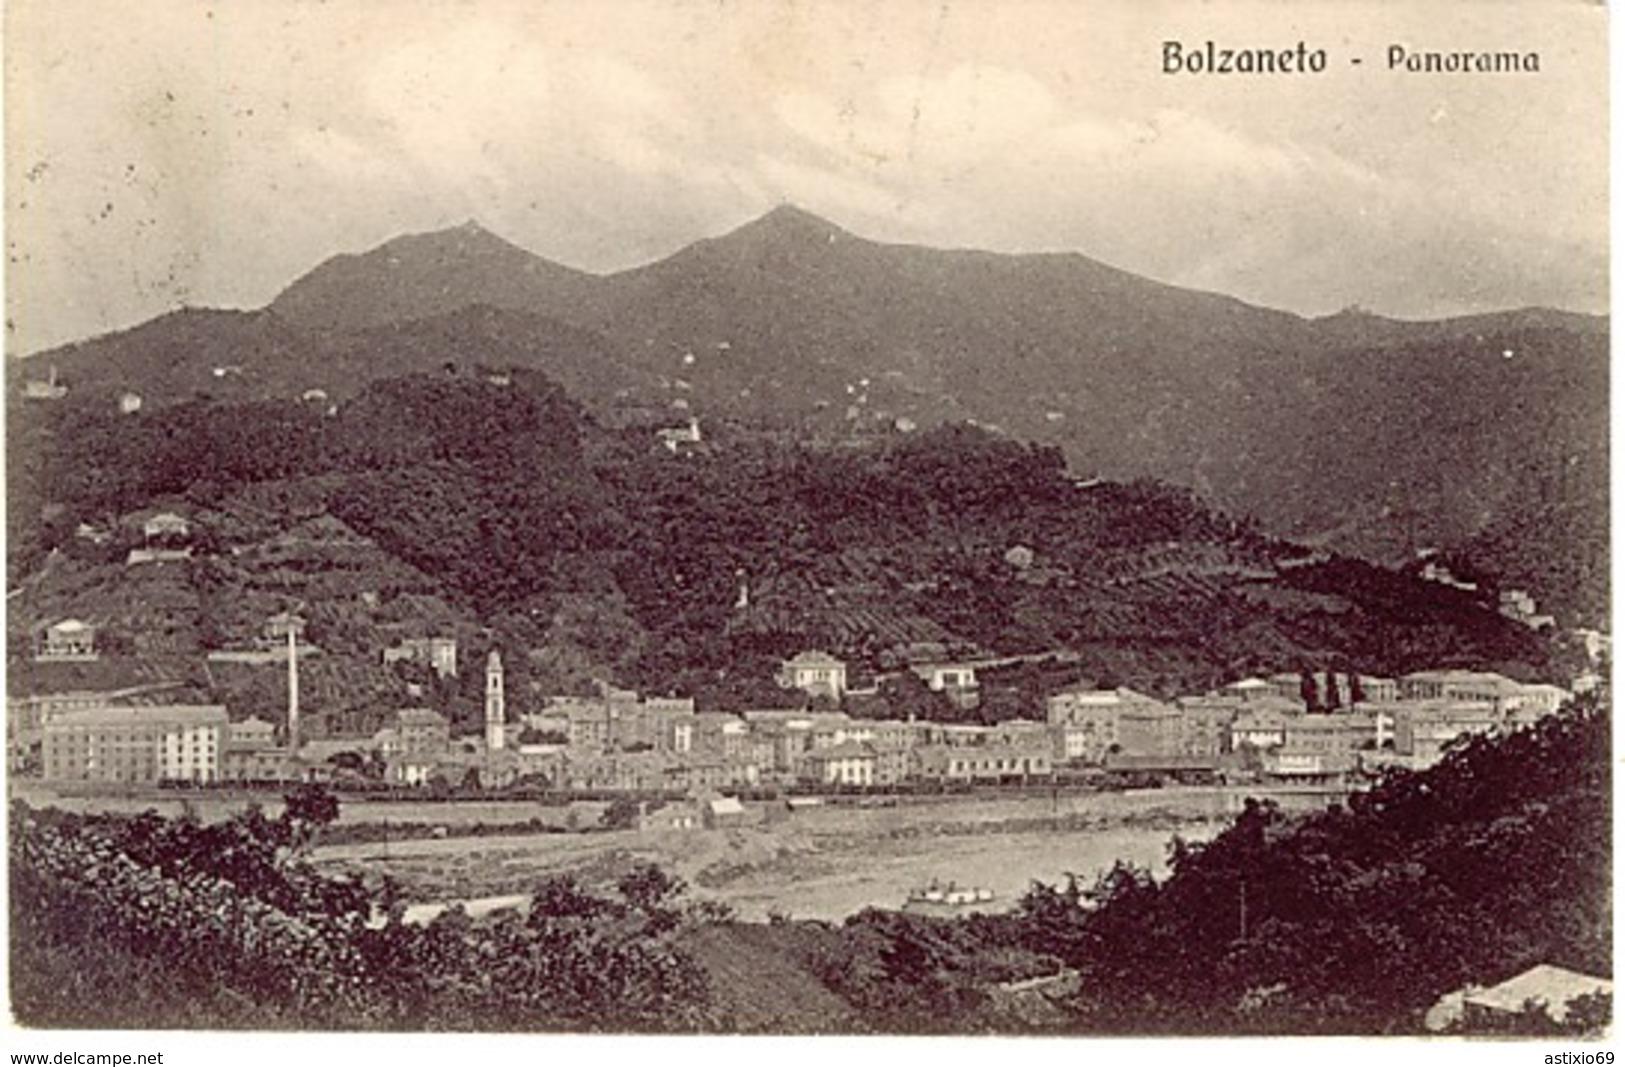 GENOVA BOLZANETO PANORAMA 1918 - Genova (Genoa)